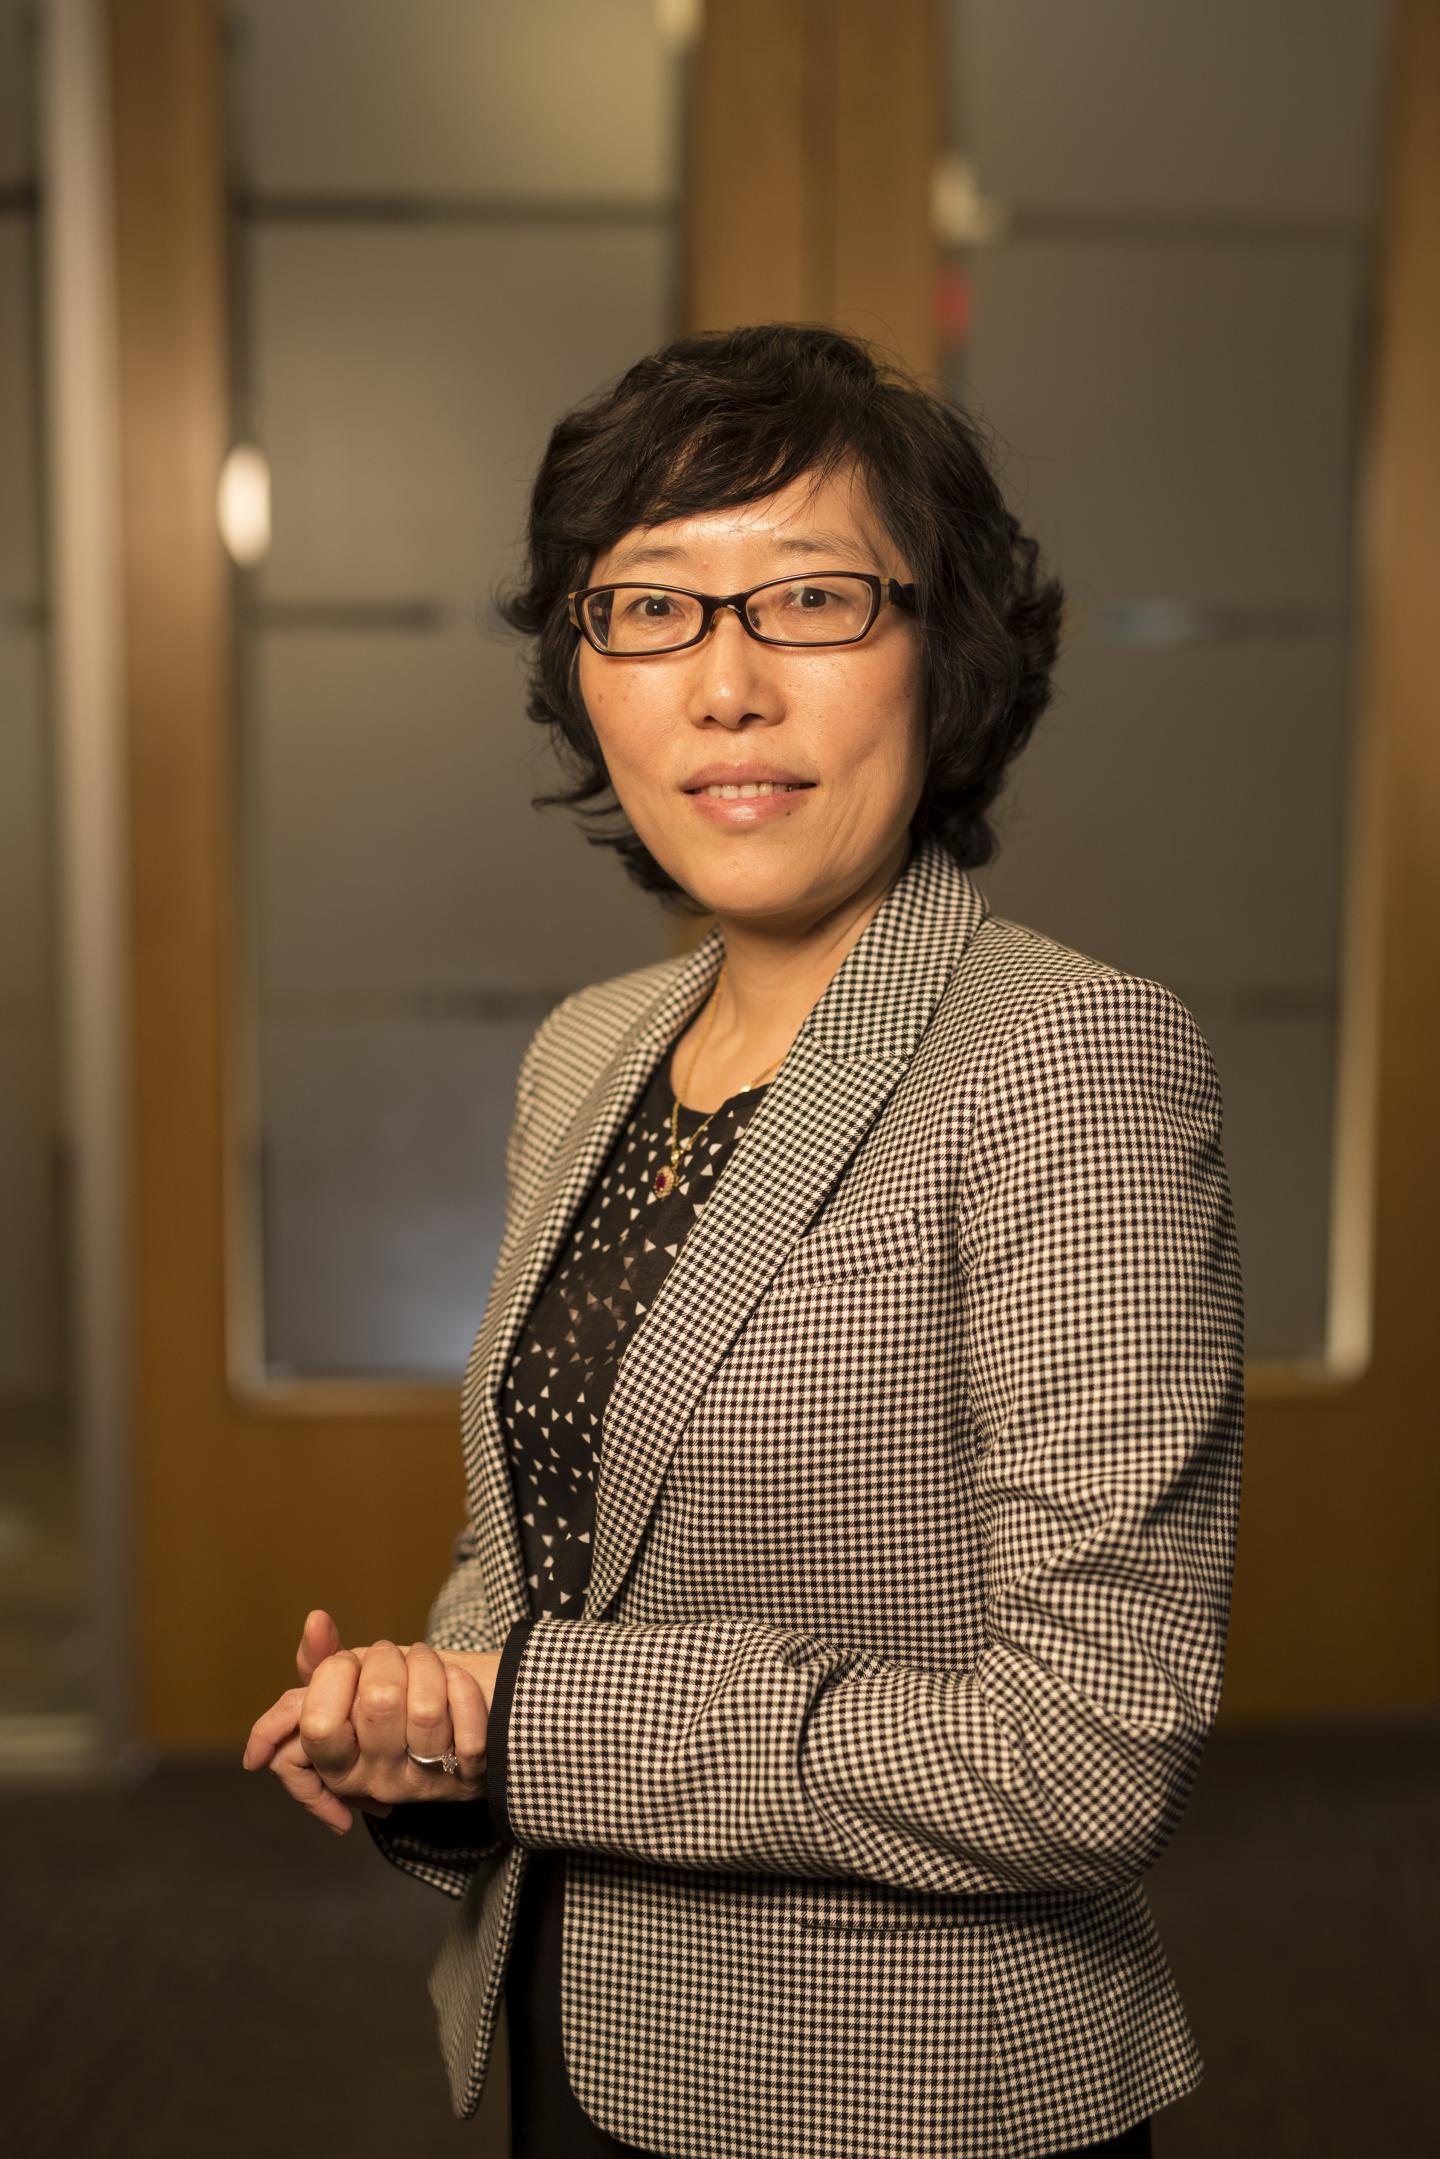 Dr. Xiao-Ou Shu, Vanderbilt University Medical Center